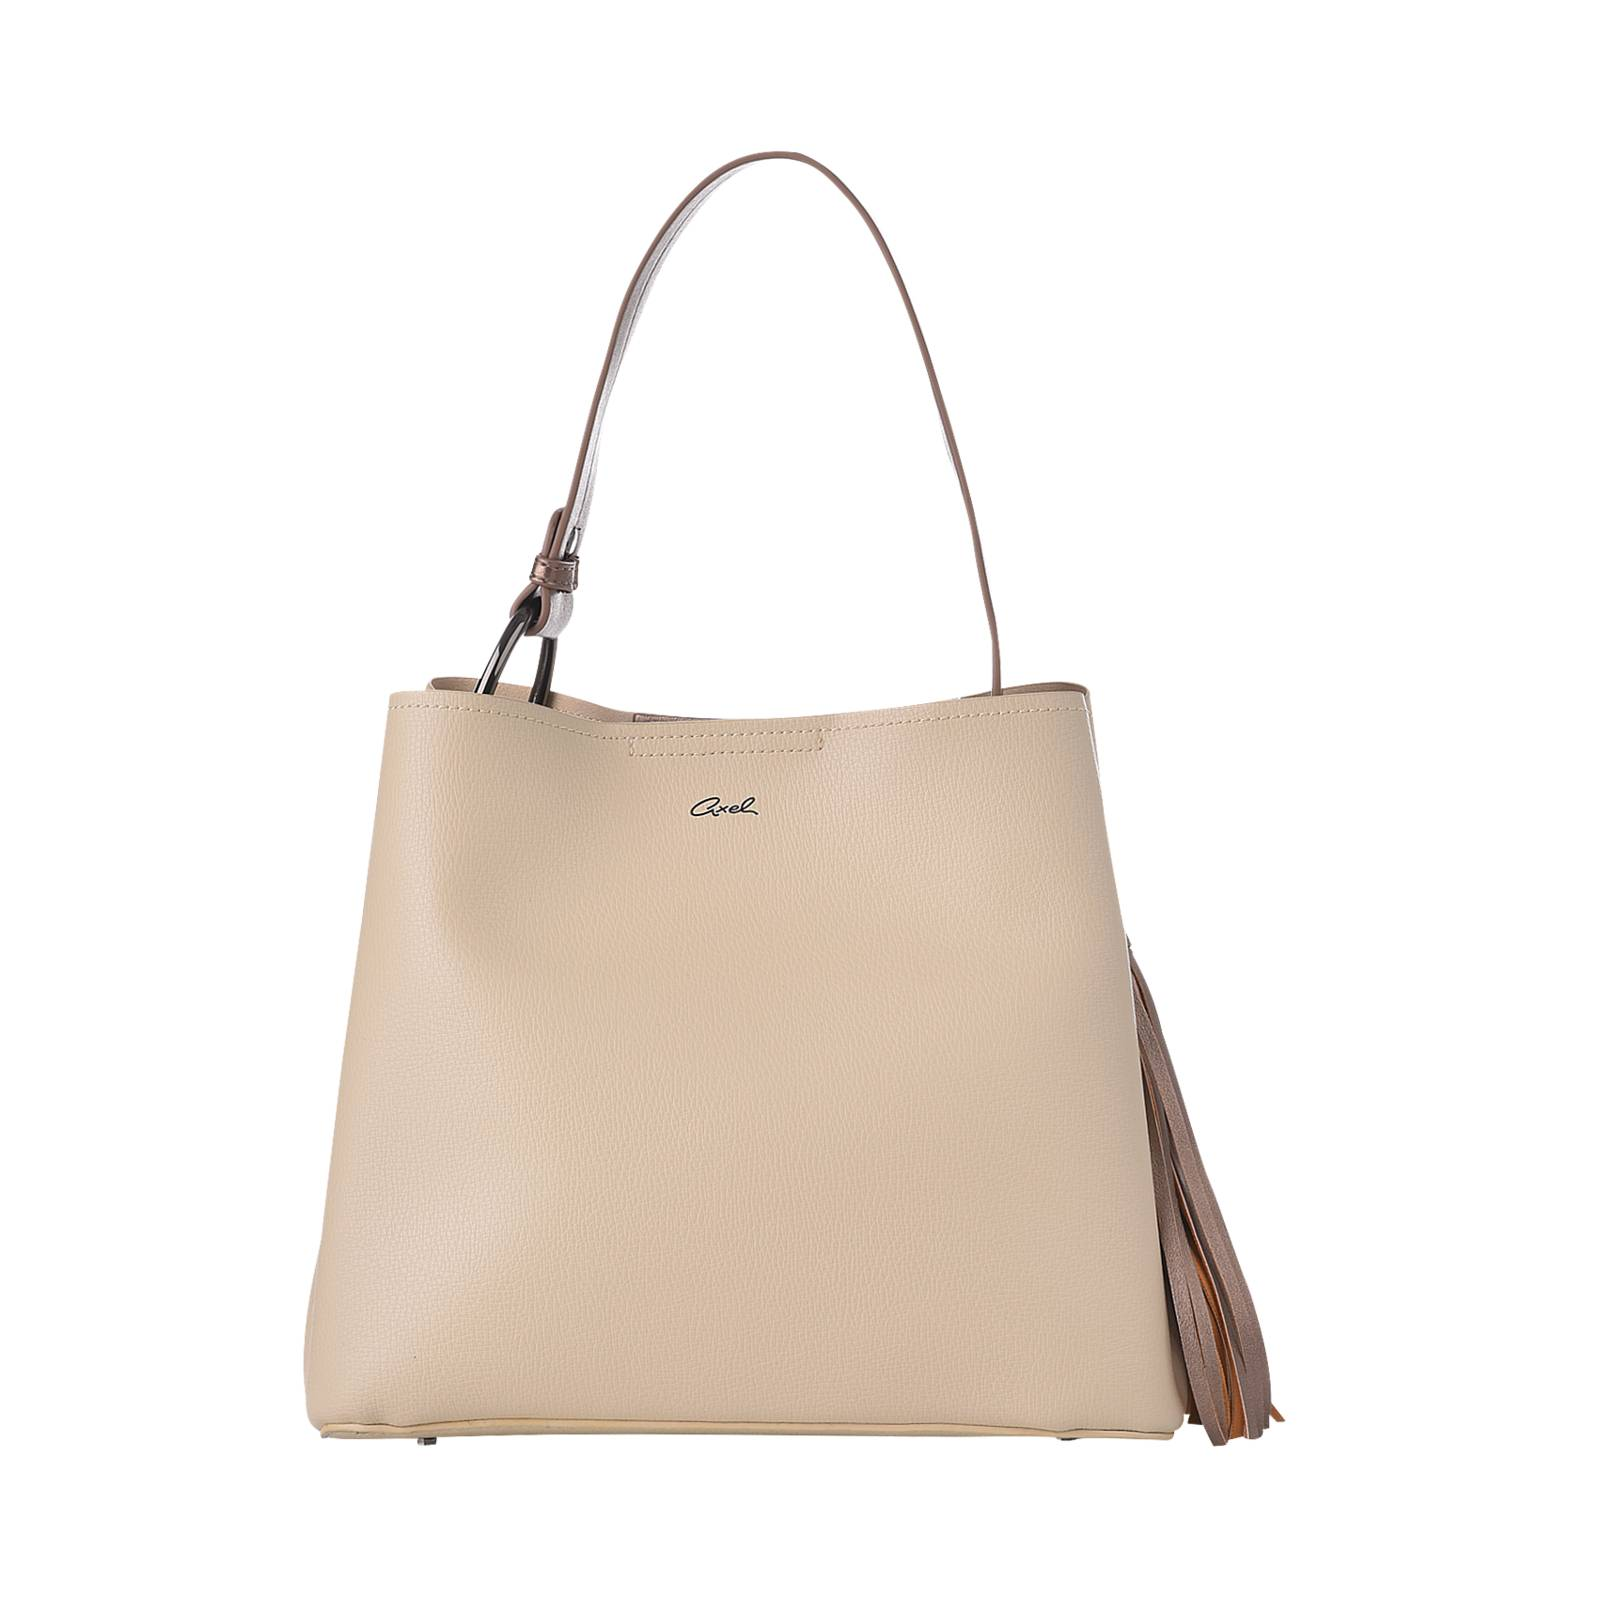 Evangeline - Γυναικεία τσάντα Axel από δερμα συνθετικο - Gianna ... d4bcb2b5bb0